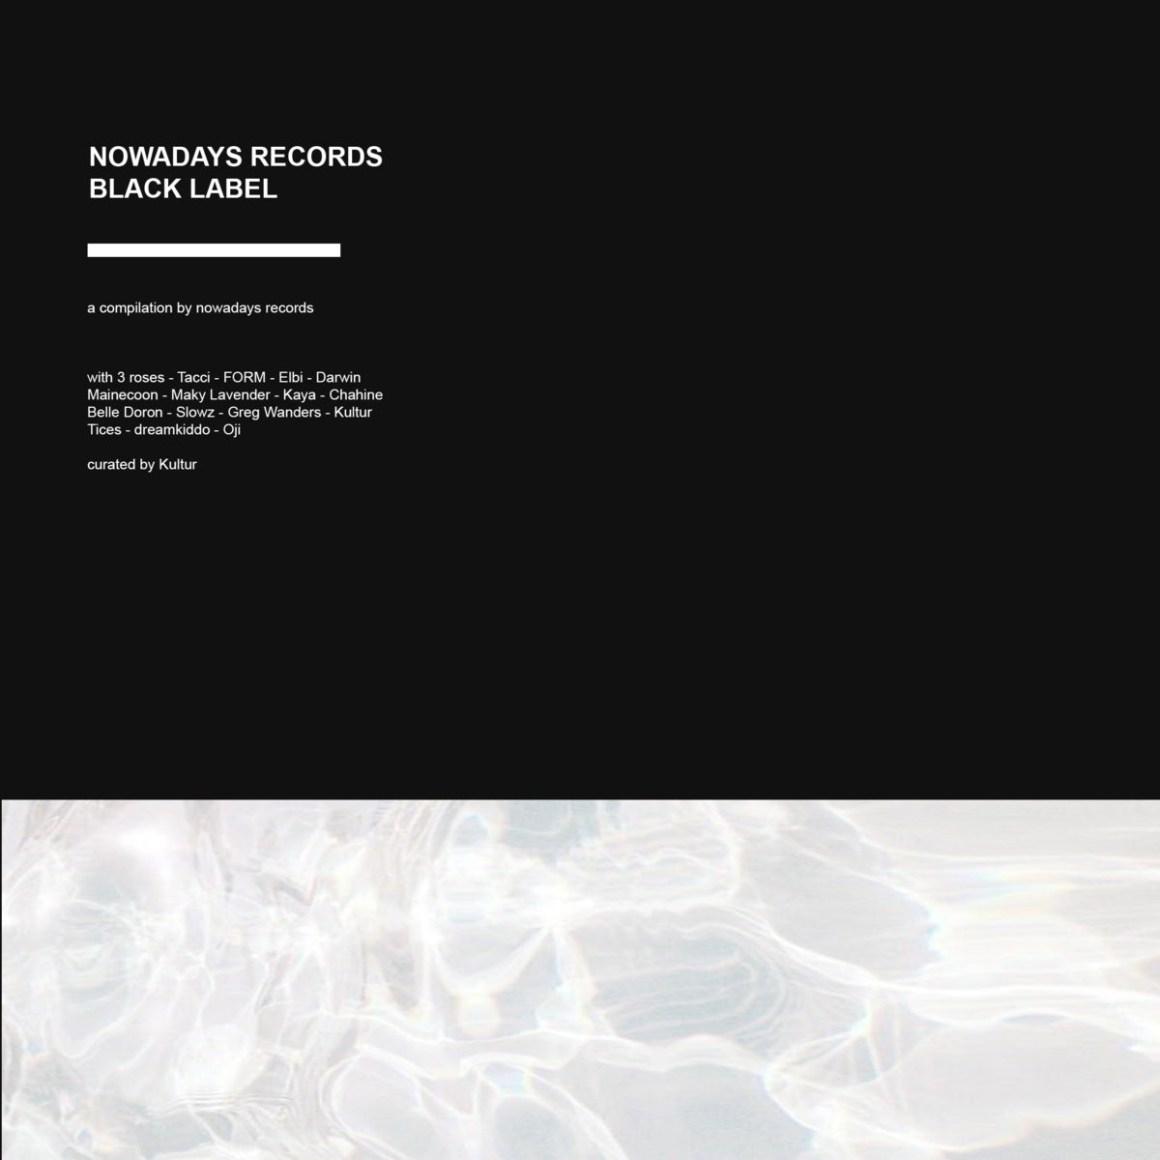 nowadays records black label